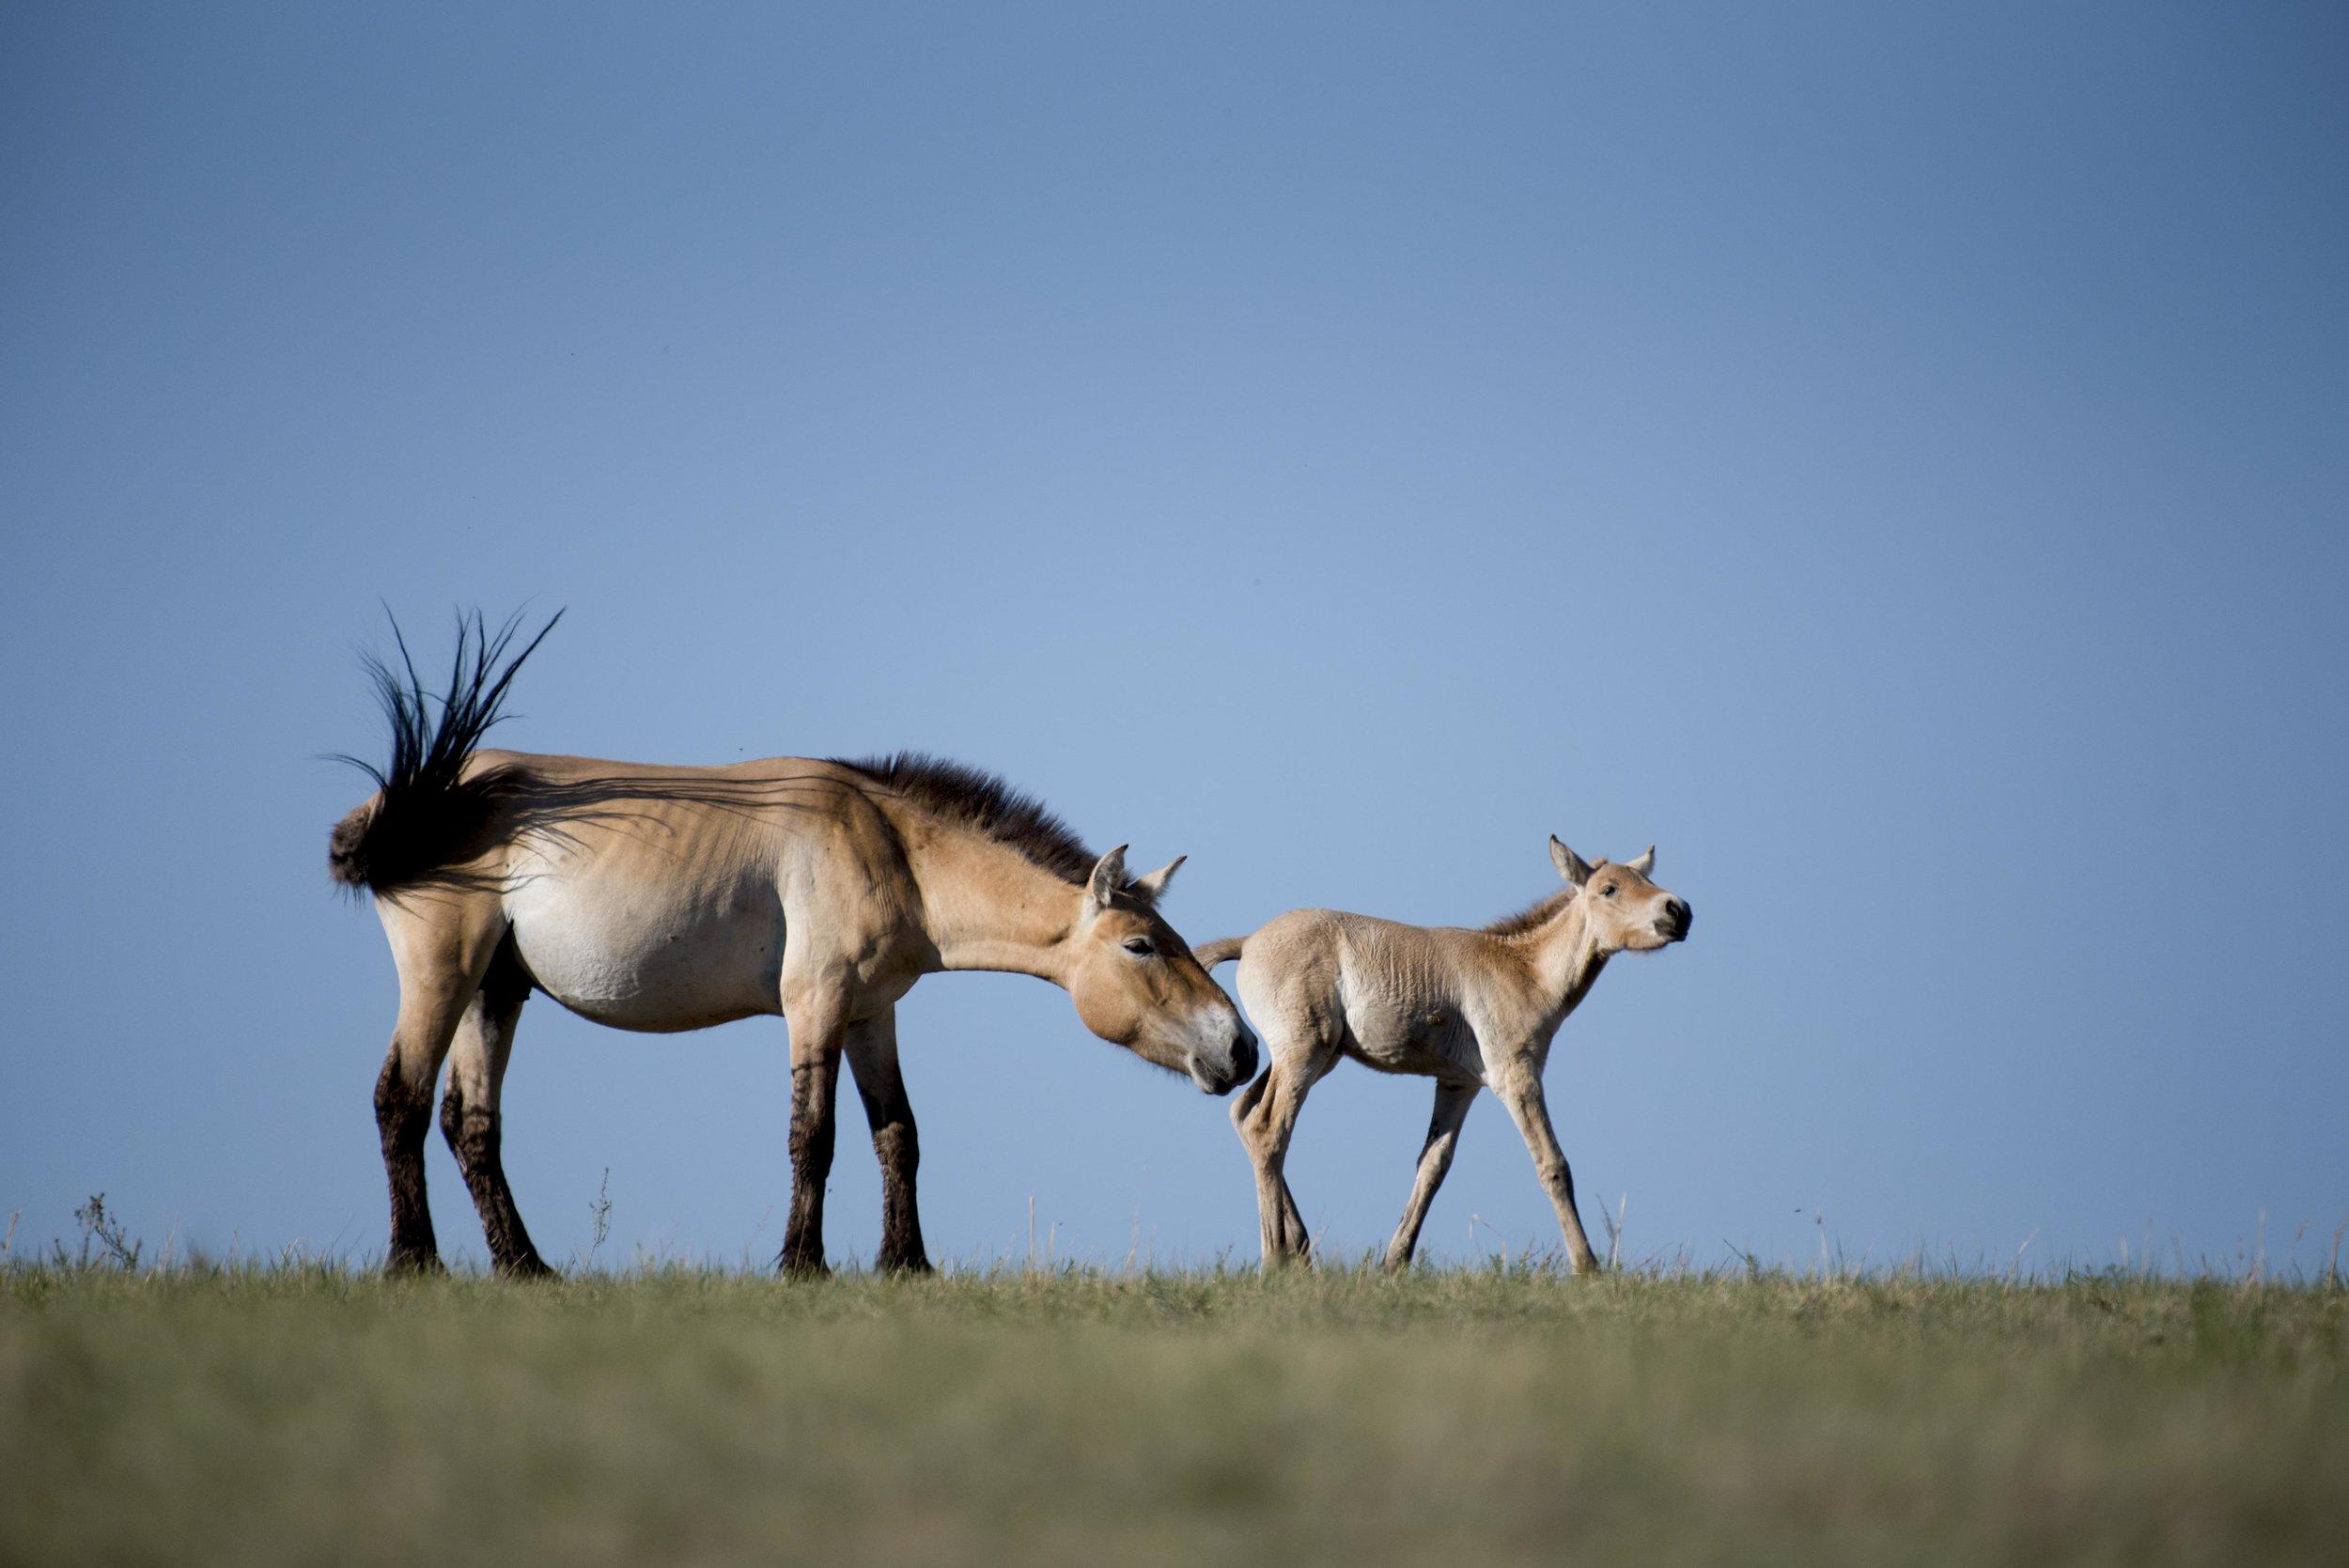 20170622-Mongolia horses 12.jpg